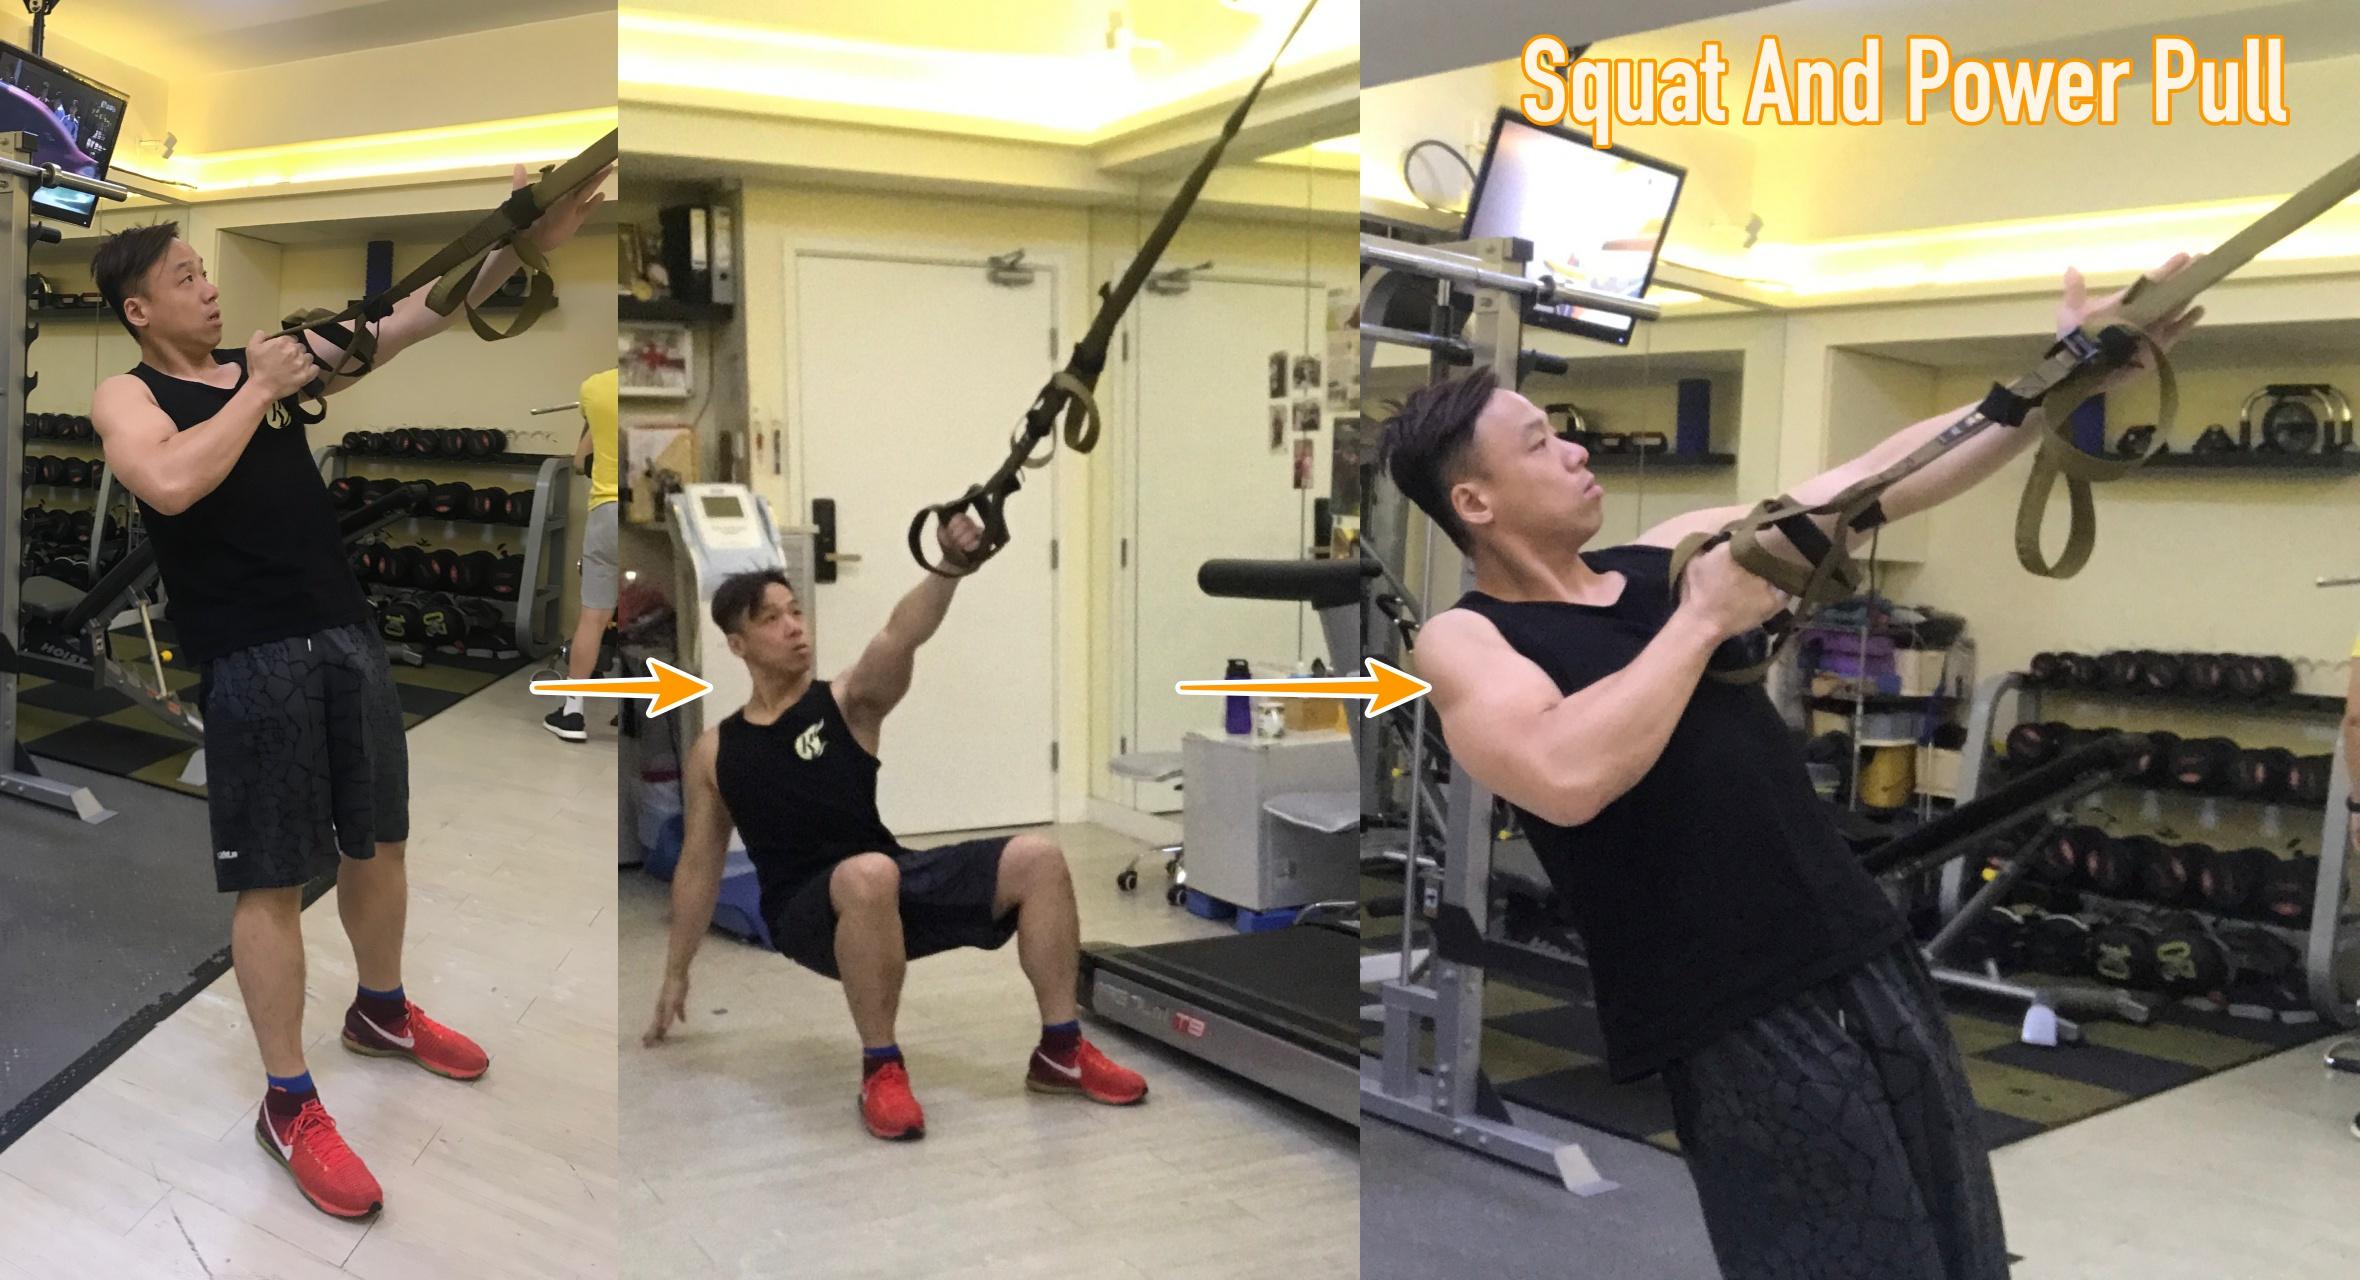 TRX訓練動作 Squat and Power Pull